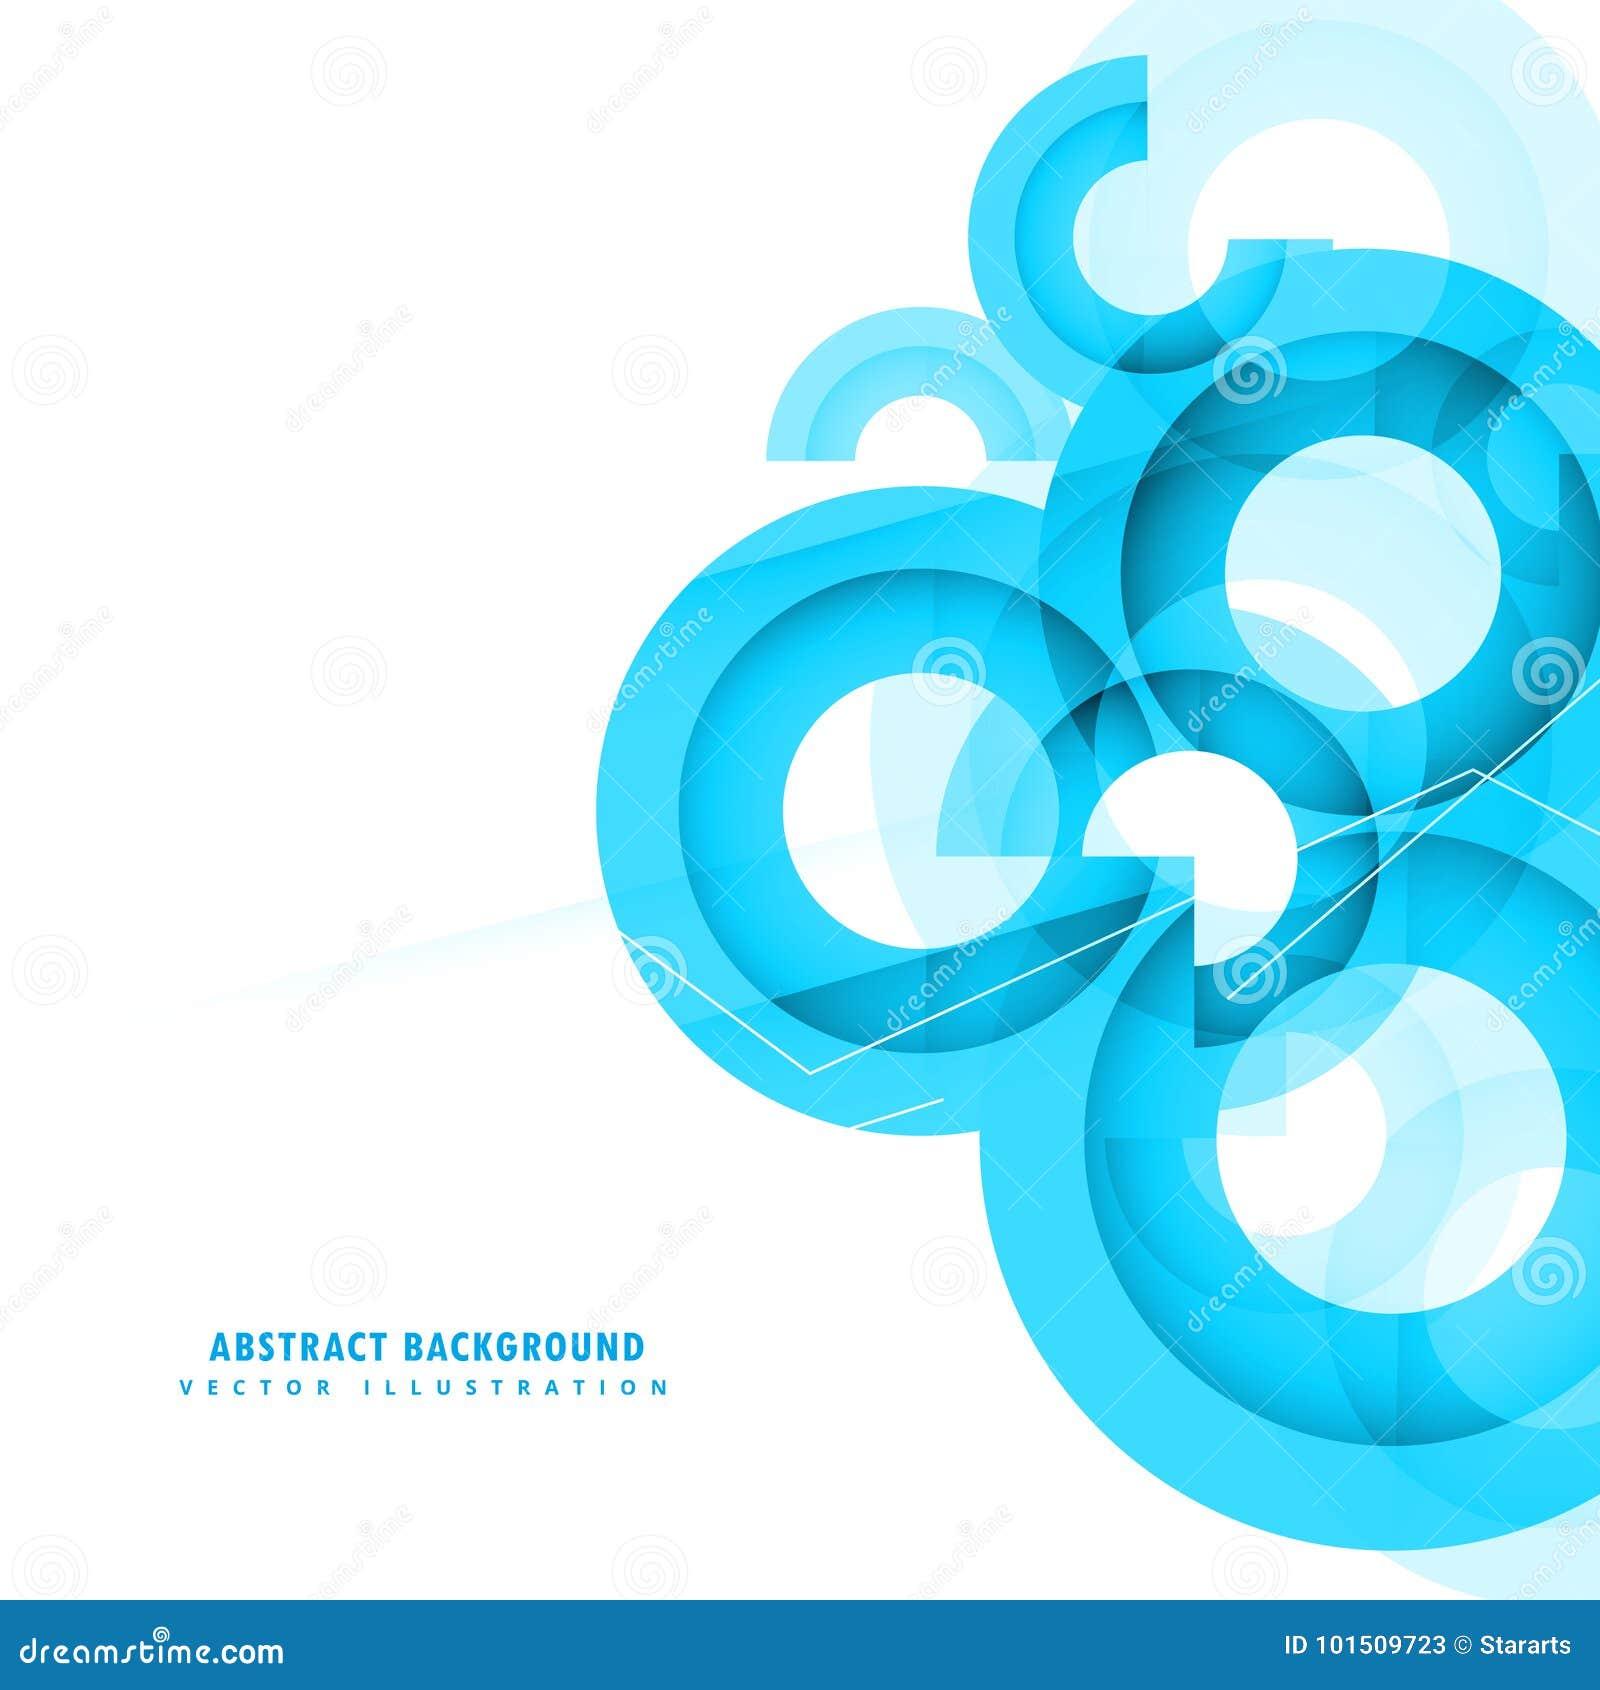 Conception abstraite de fond de cercles de bleu